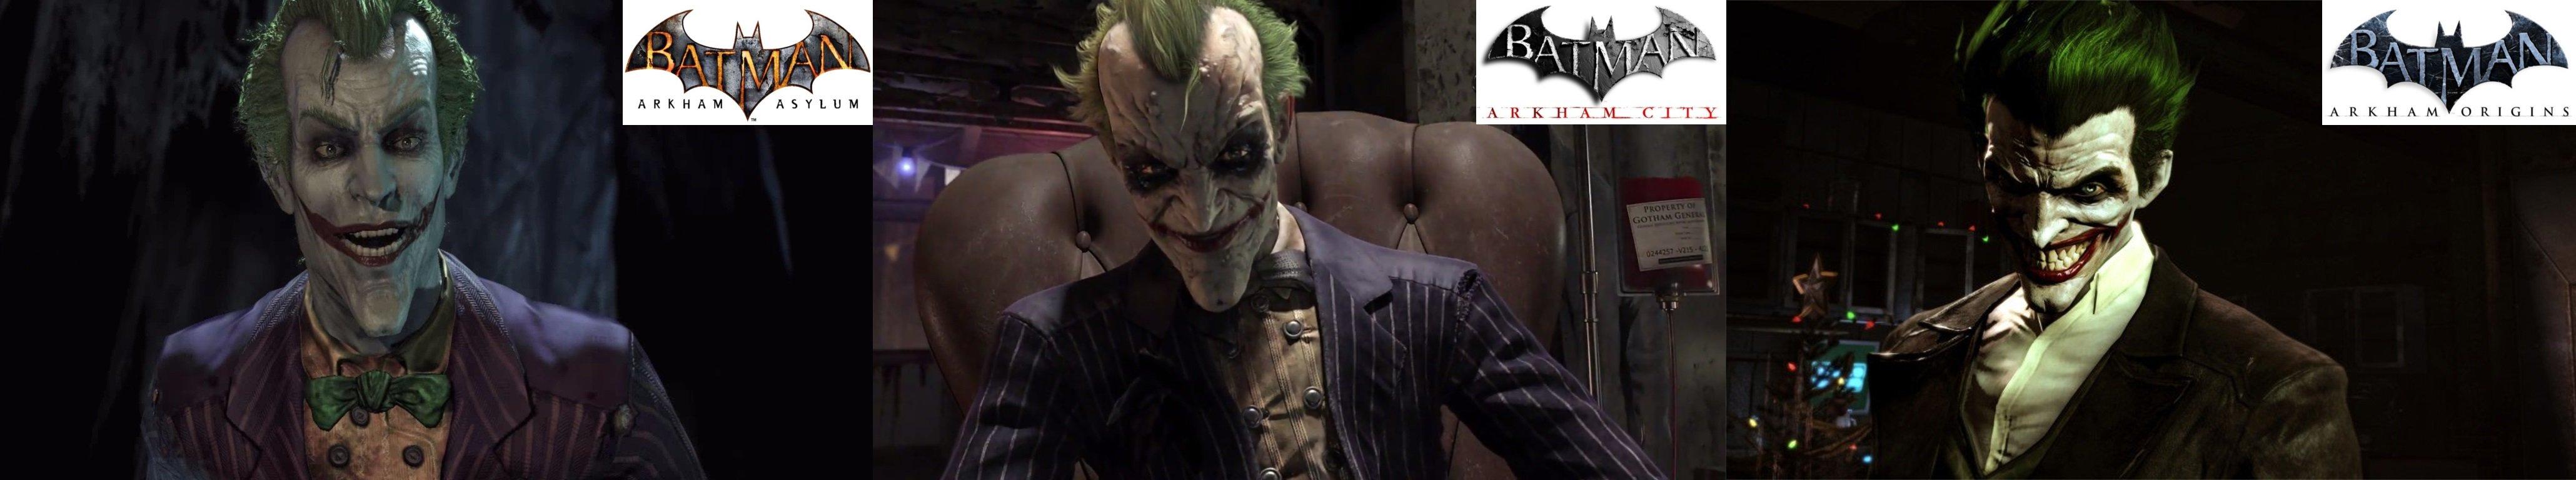 Joker Arkham Asylum Wallpaper - WallpaperSafari